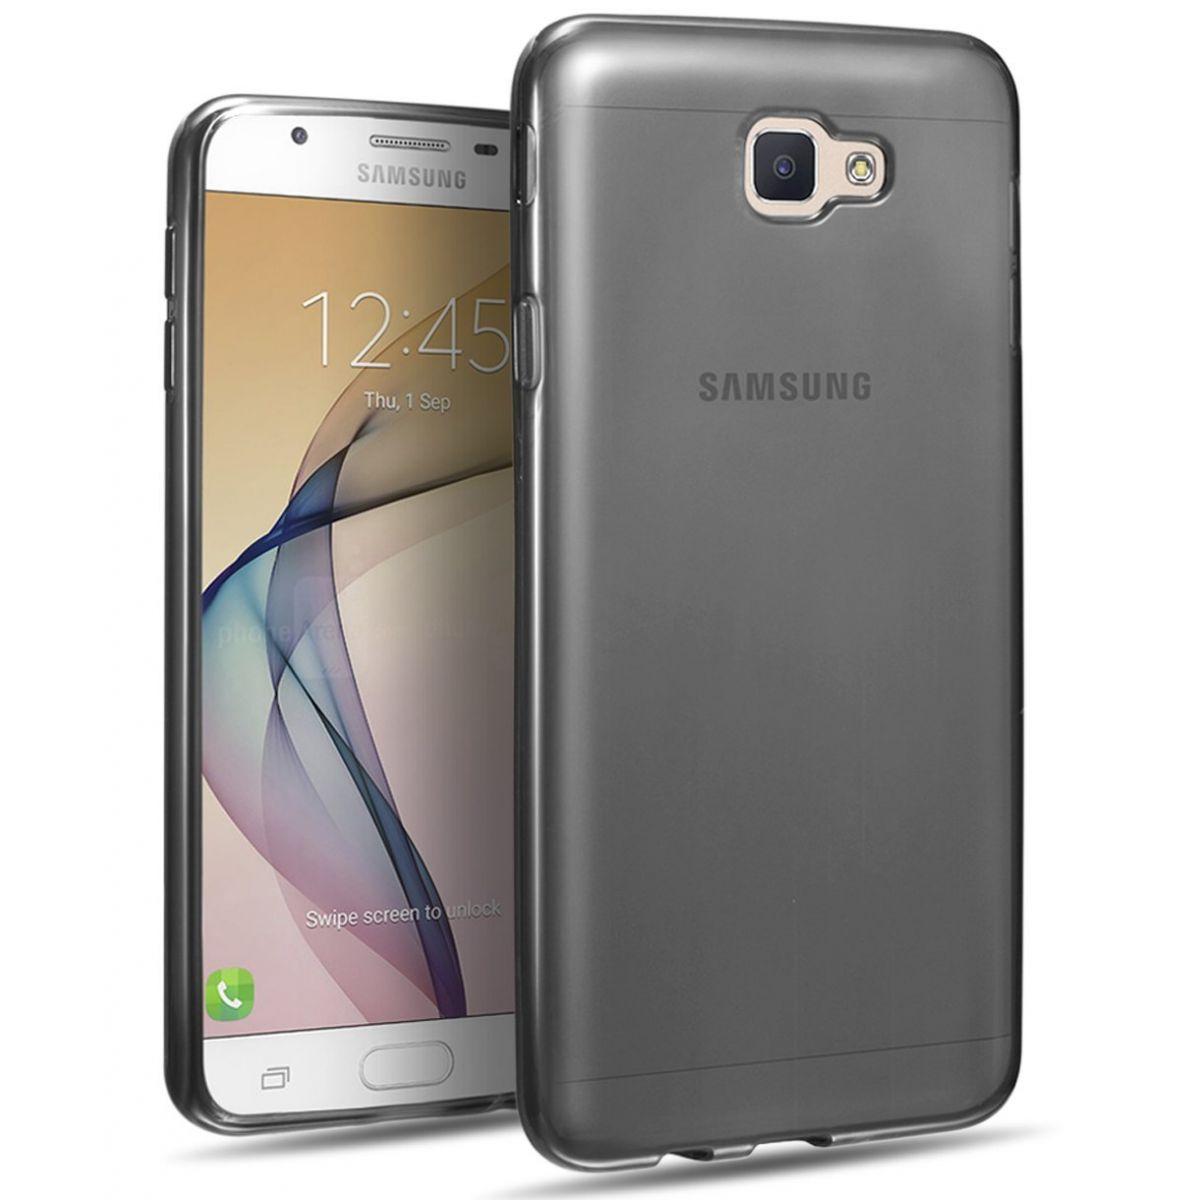 5c444d0c3 Kit 2 em 1 Película de Vidro Premium e Capa Anti Impacto preta para Samsung  Galaxy J7 Prime